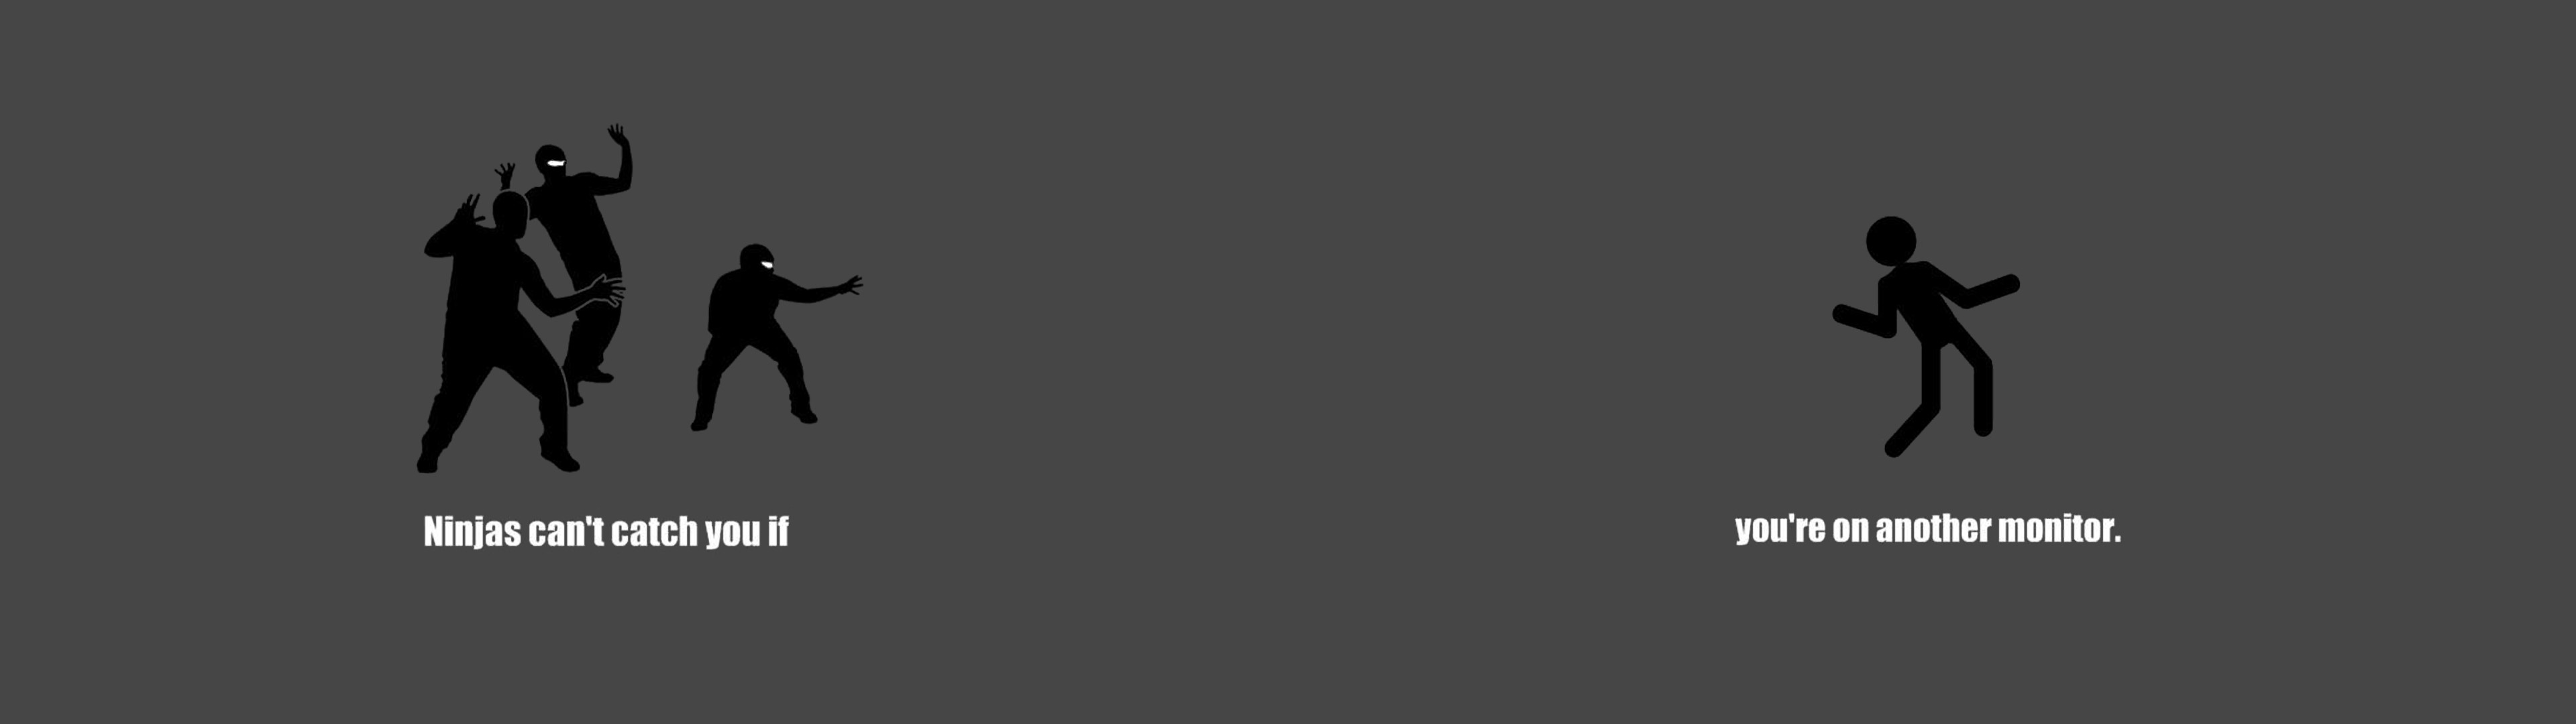 my dual screen wallpaper dump – Album on Imgur | Images Wallpapers  | Pinterest | Wallpaper and Screen wallpaper